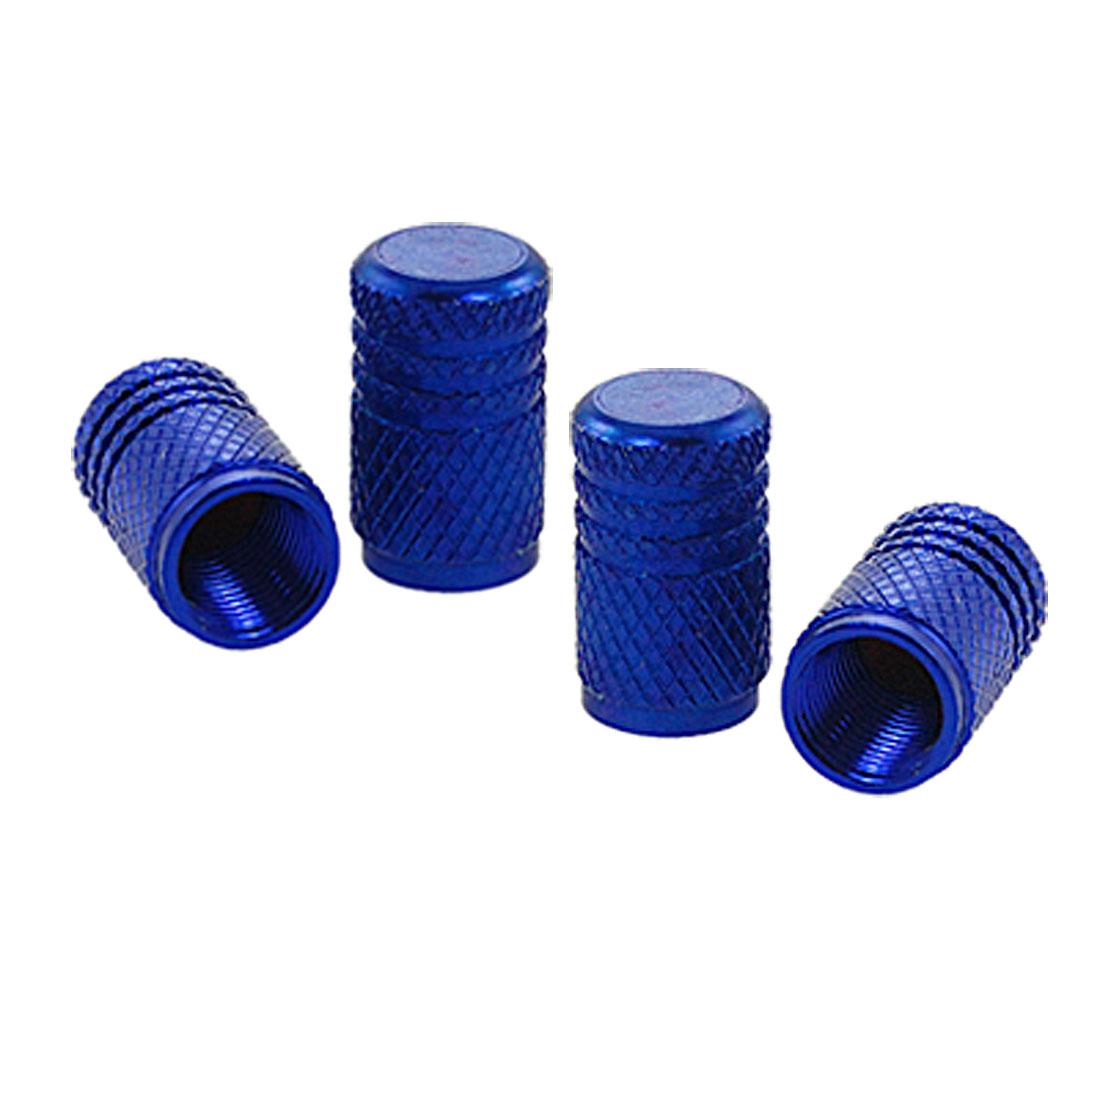 Knurling Pattern Metal Car Auto Tyre Tire Stem Covers Caps 4 Pcs